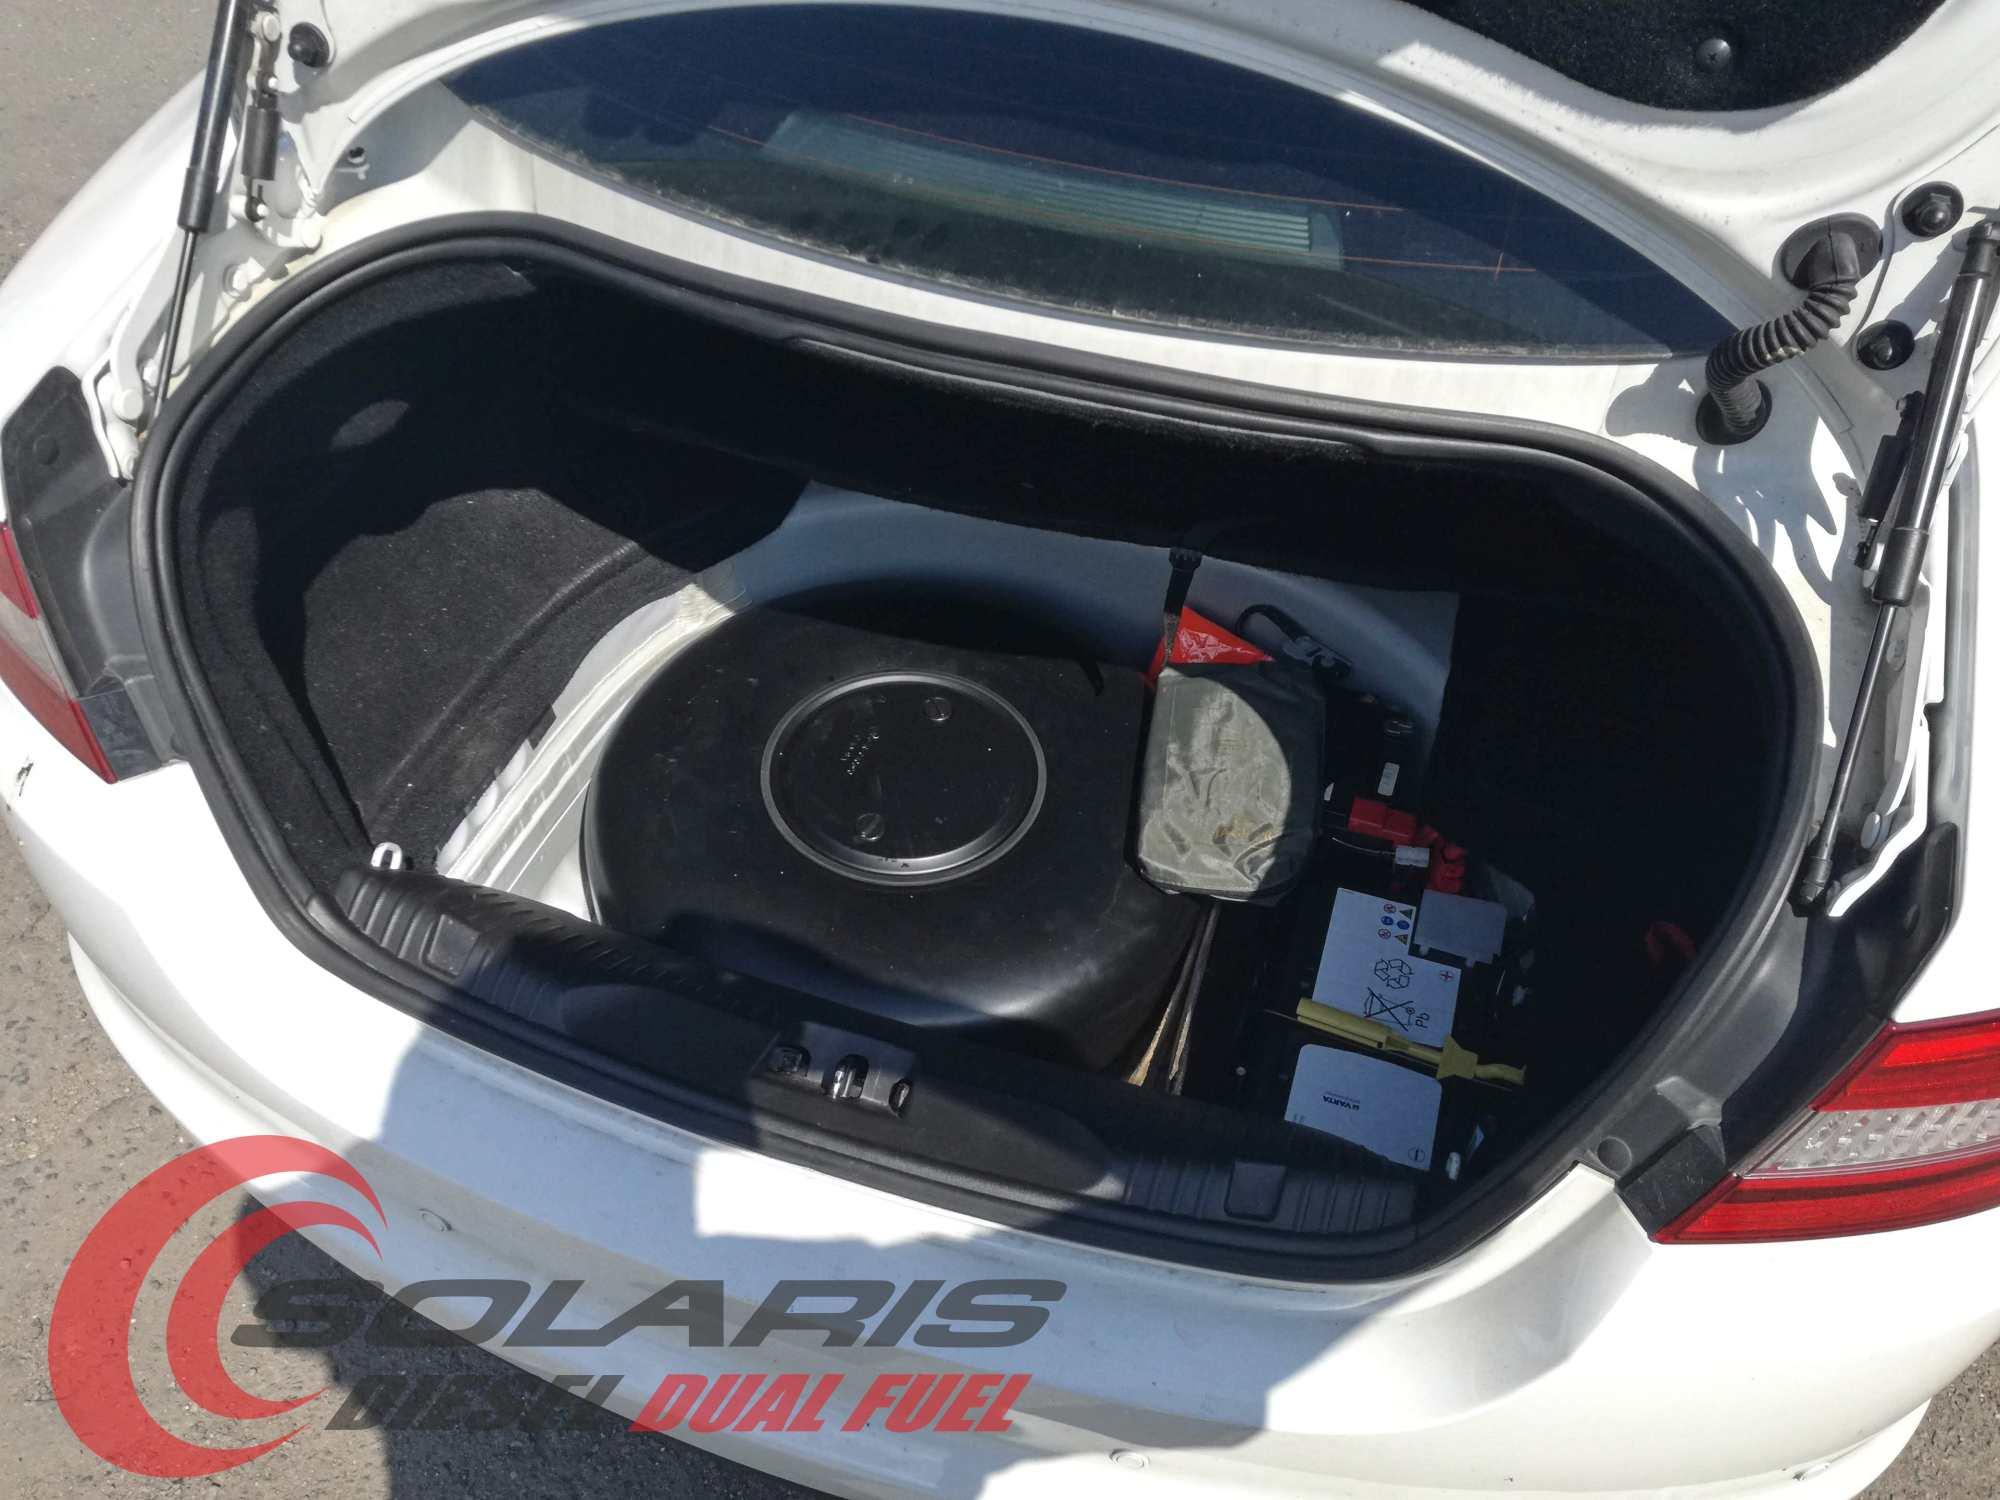 Jaguar 2.2 diesel přestavba na duální pohon diesel+lpg se systémem Solaris Diesel LPG